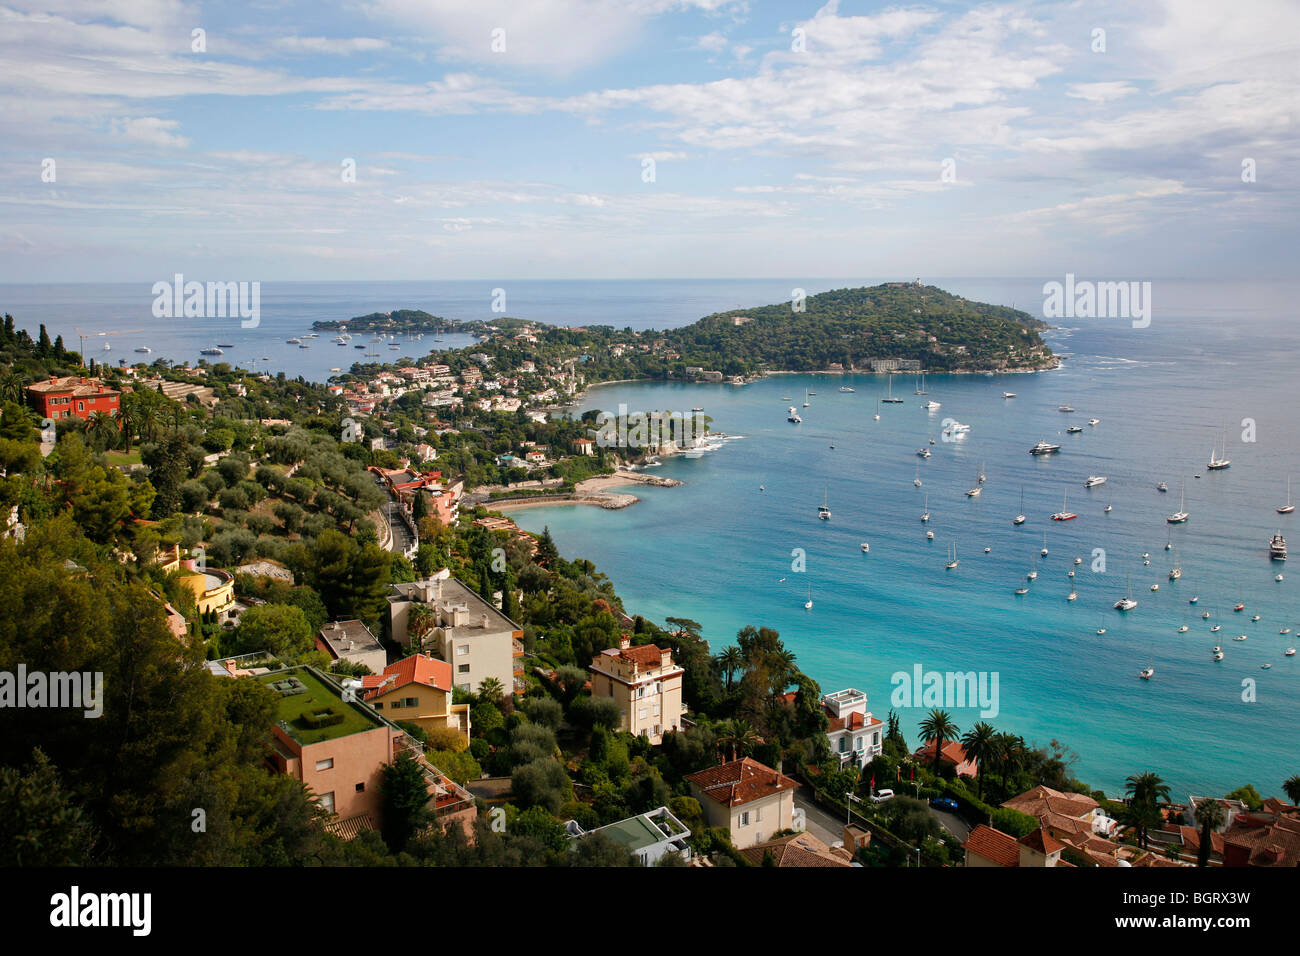 View of Villefranche sur Mer, Cote d'Azur, Alpes Maritimes, Provence, France. - Stock Image